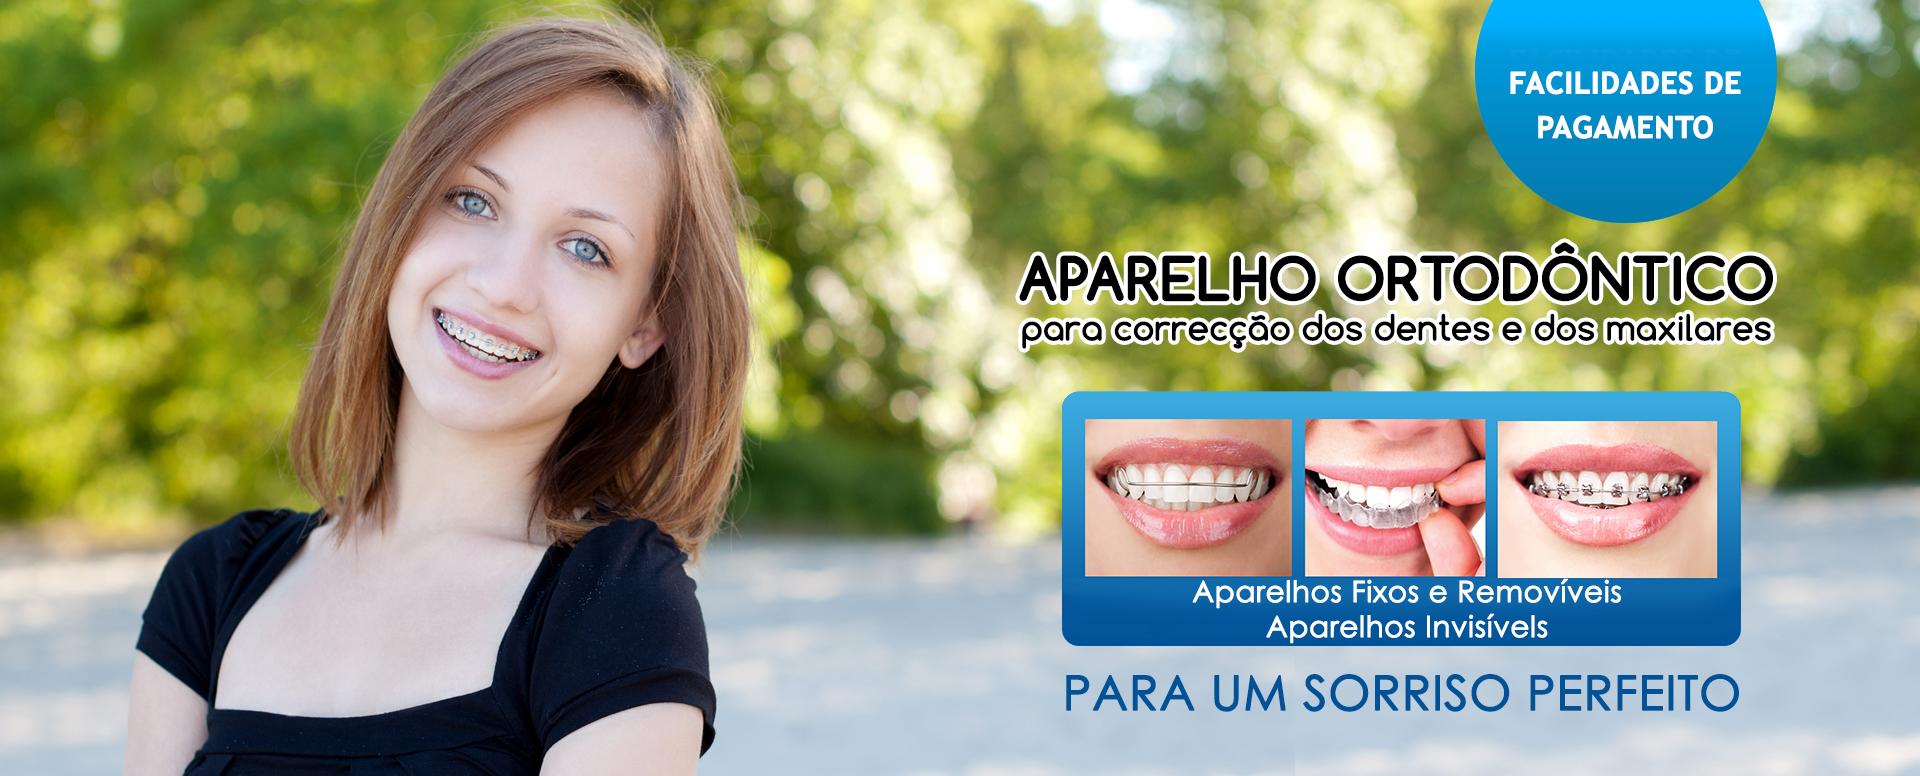 http://imdentalcare.pt/site/wp-content/uploads/2018/11/im_dentalcare_topo_ortodontia2018.jpg